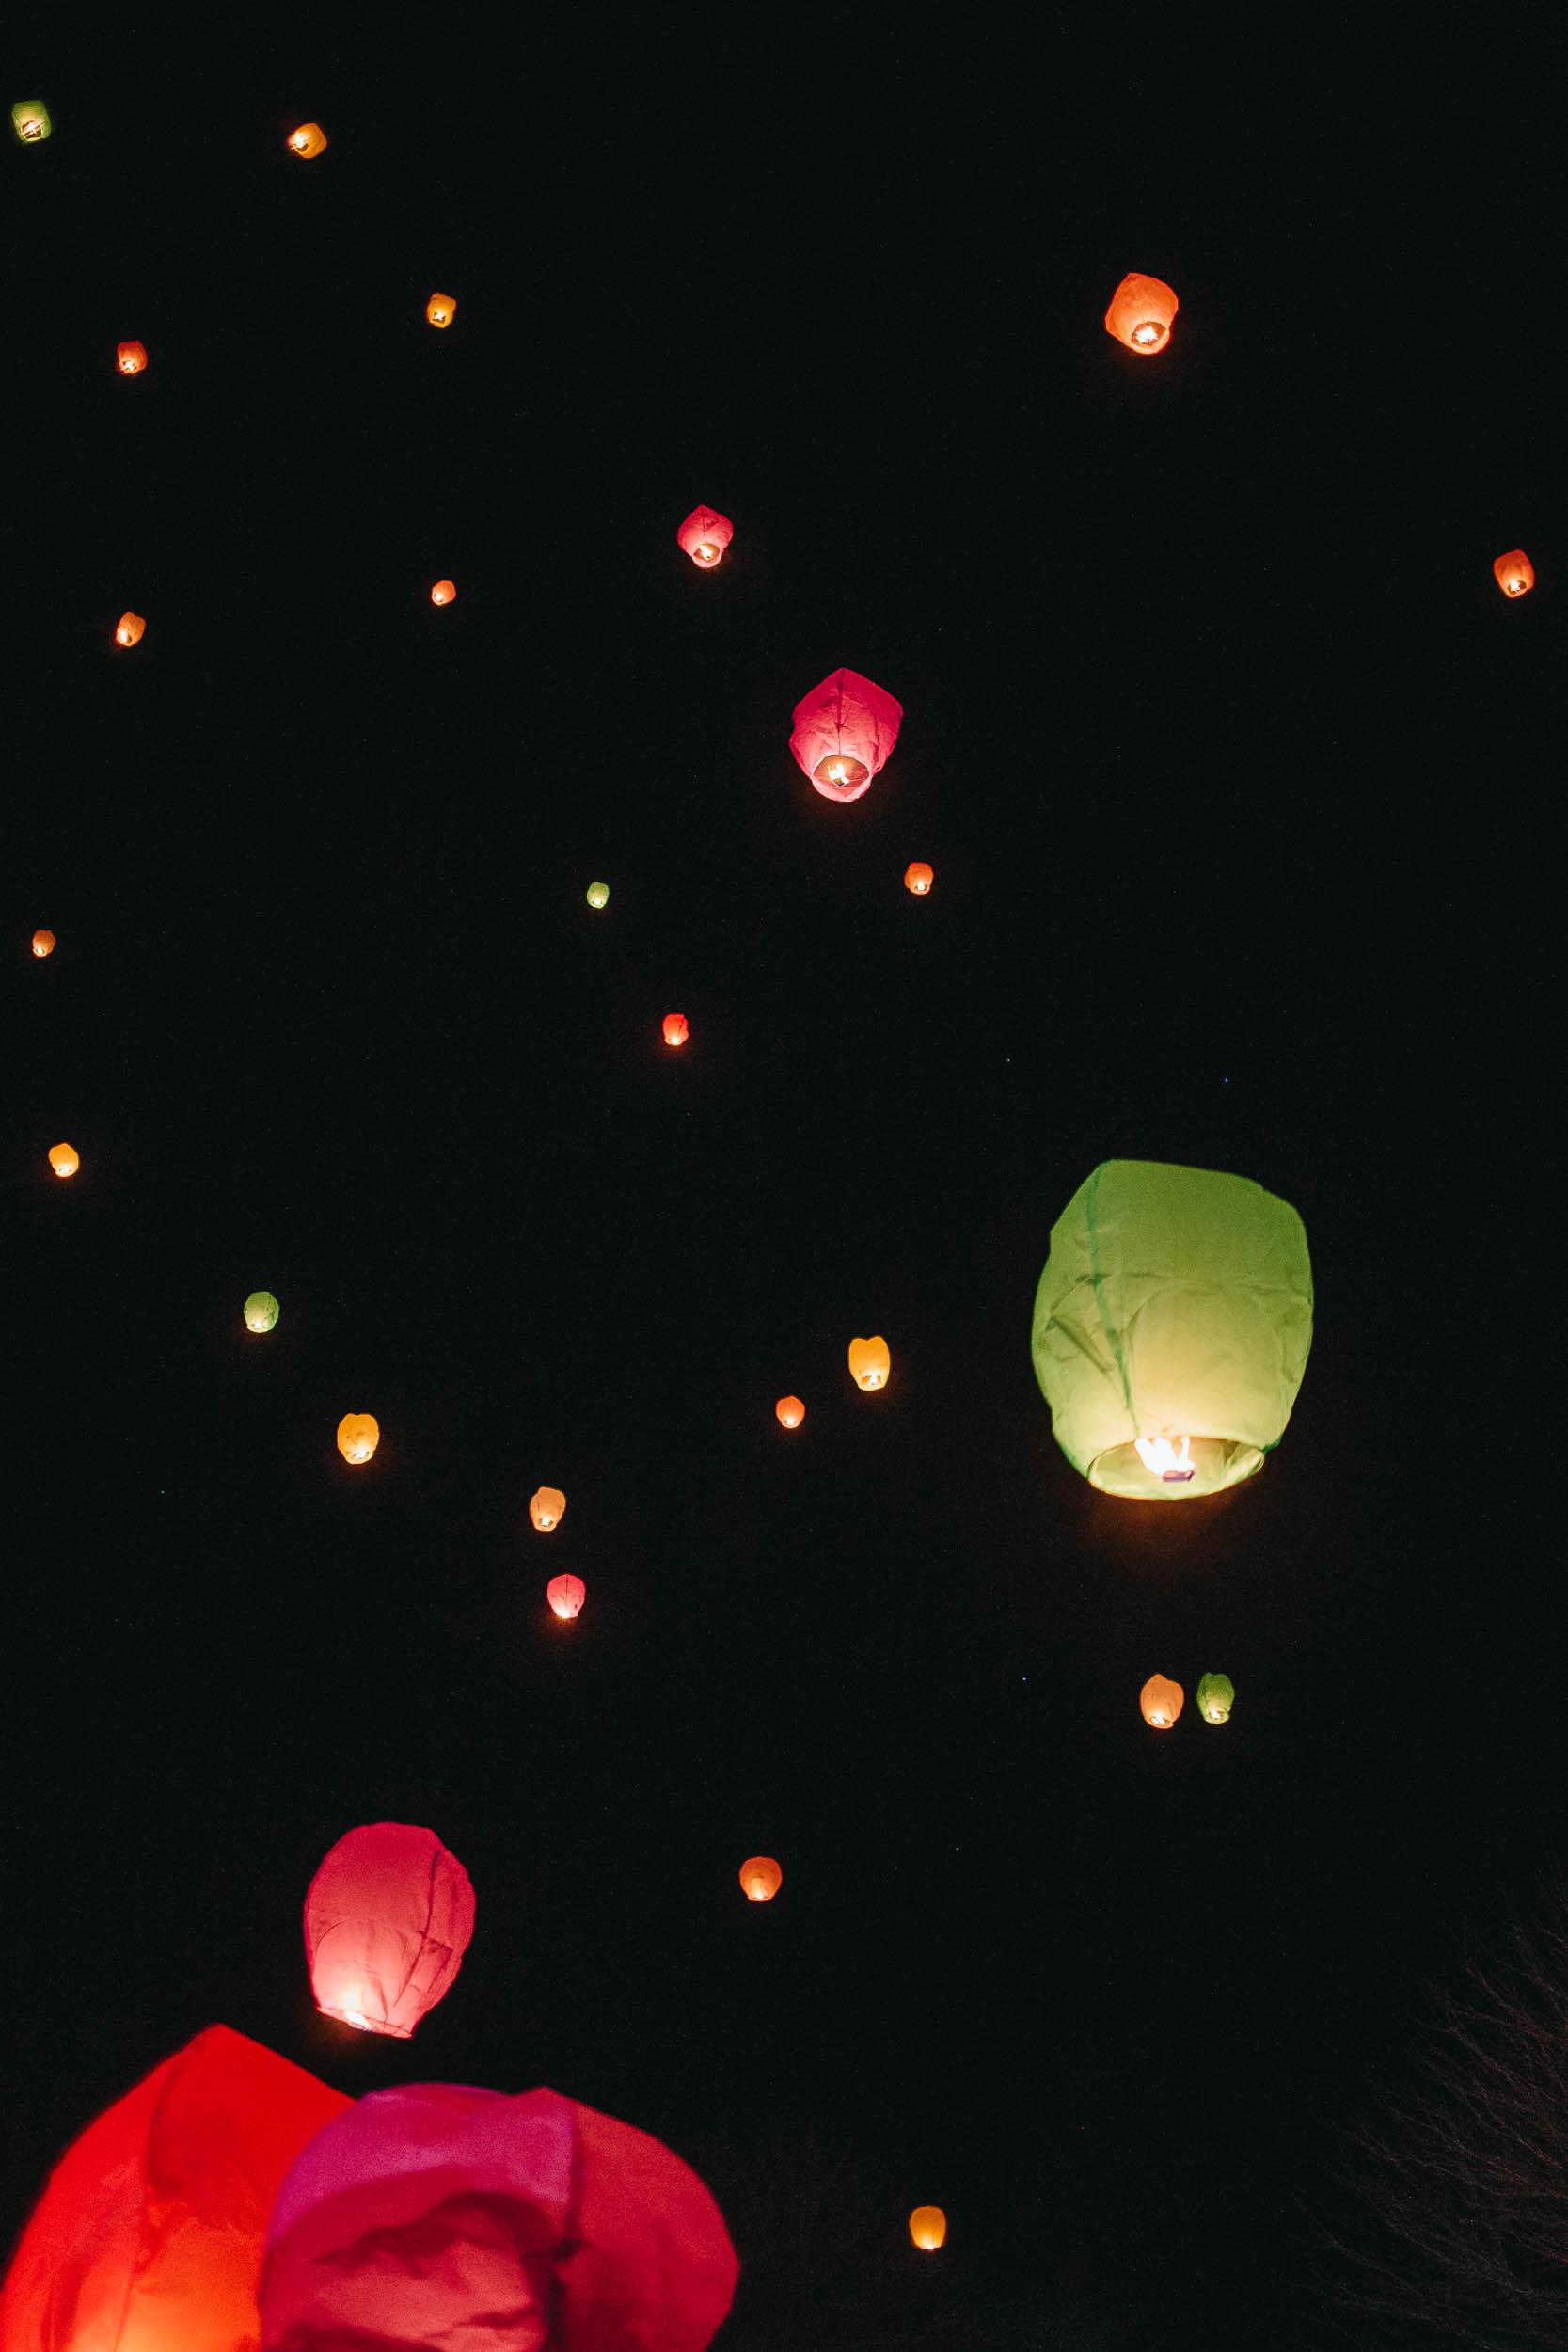 Kyle-Sheppard-Kanab-Balloon-Festival-64.jpg